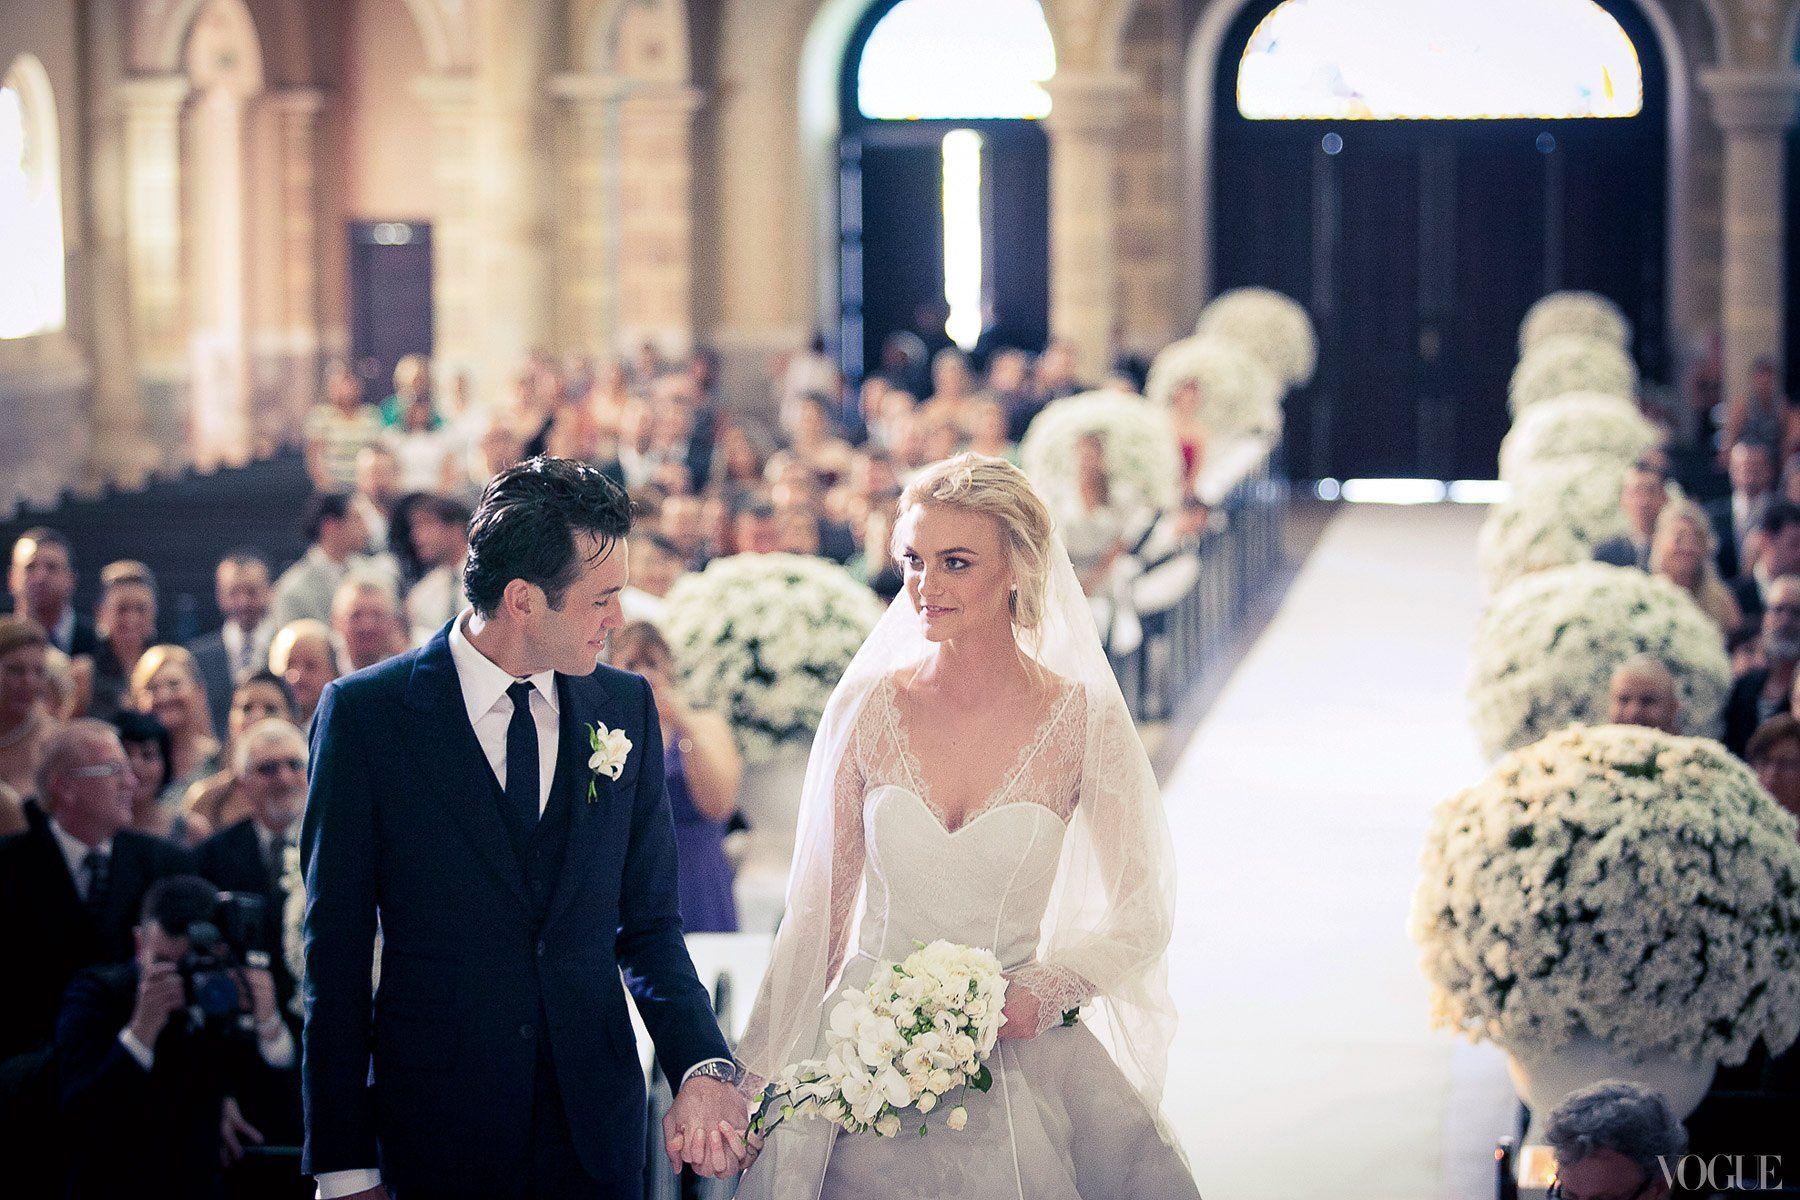 Mr. Rite Trentini wed photographer Fabio Bartelt in the